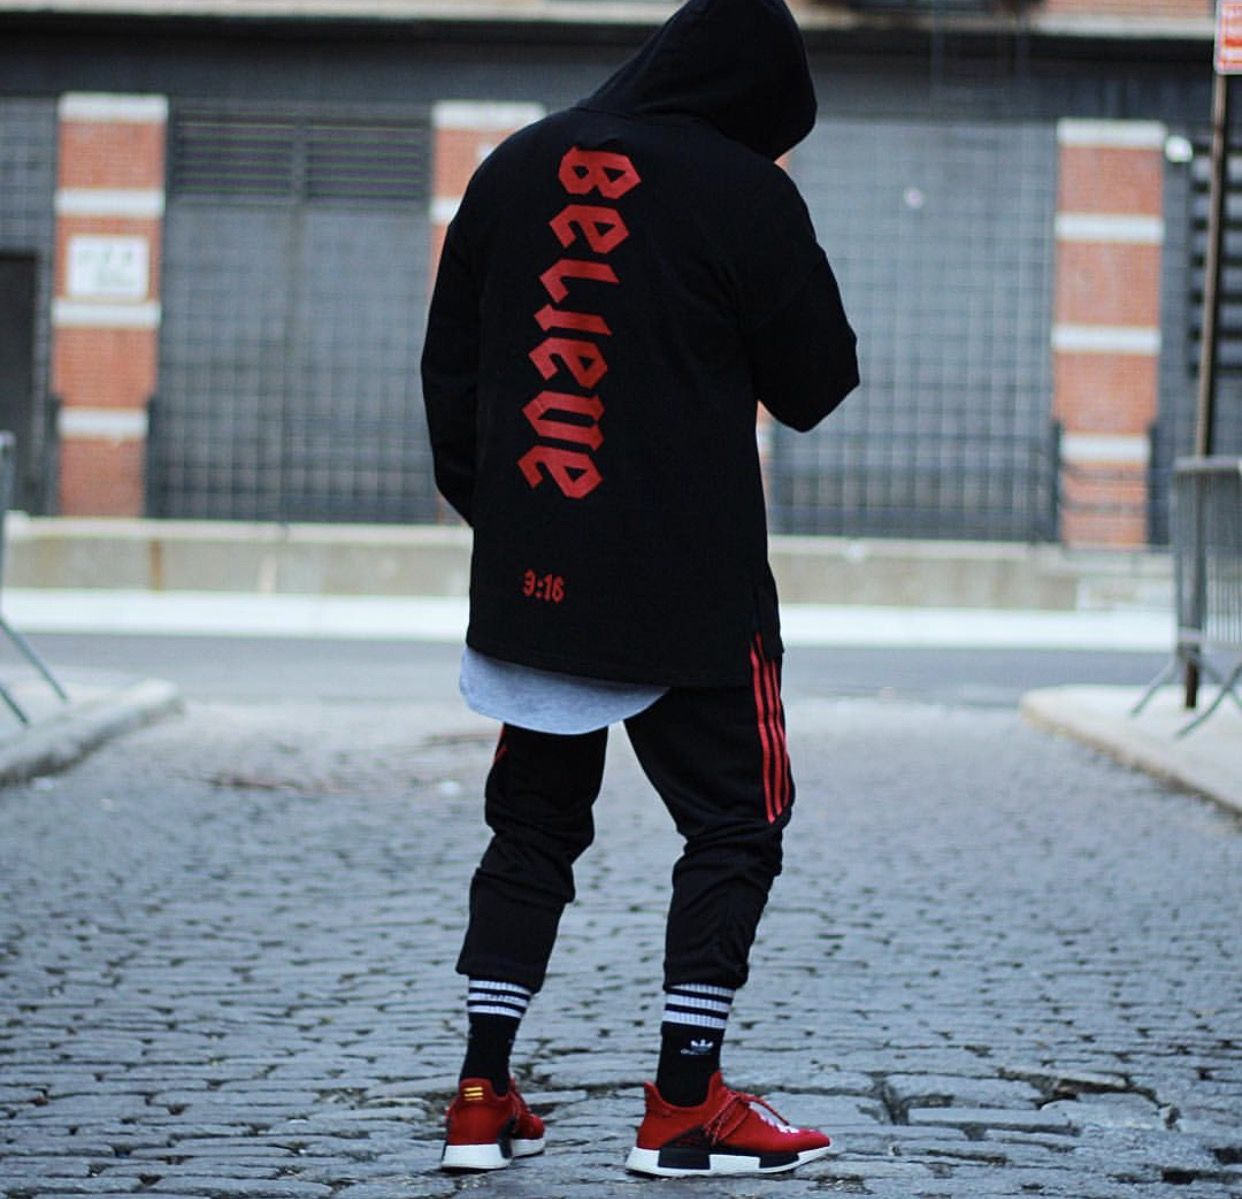 premium selection aa125 1d97d On feet: Chanel x adidas Originals Pharrell Williams Hu NMD ...